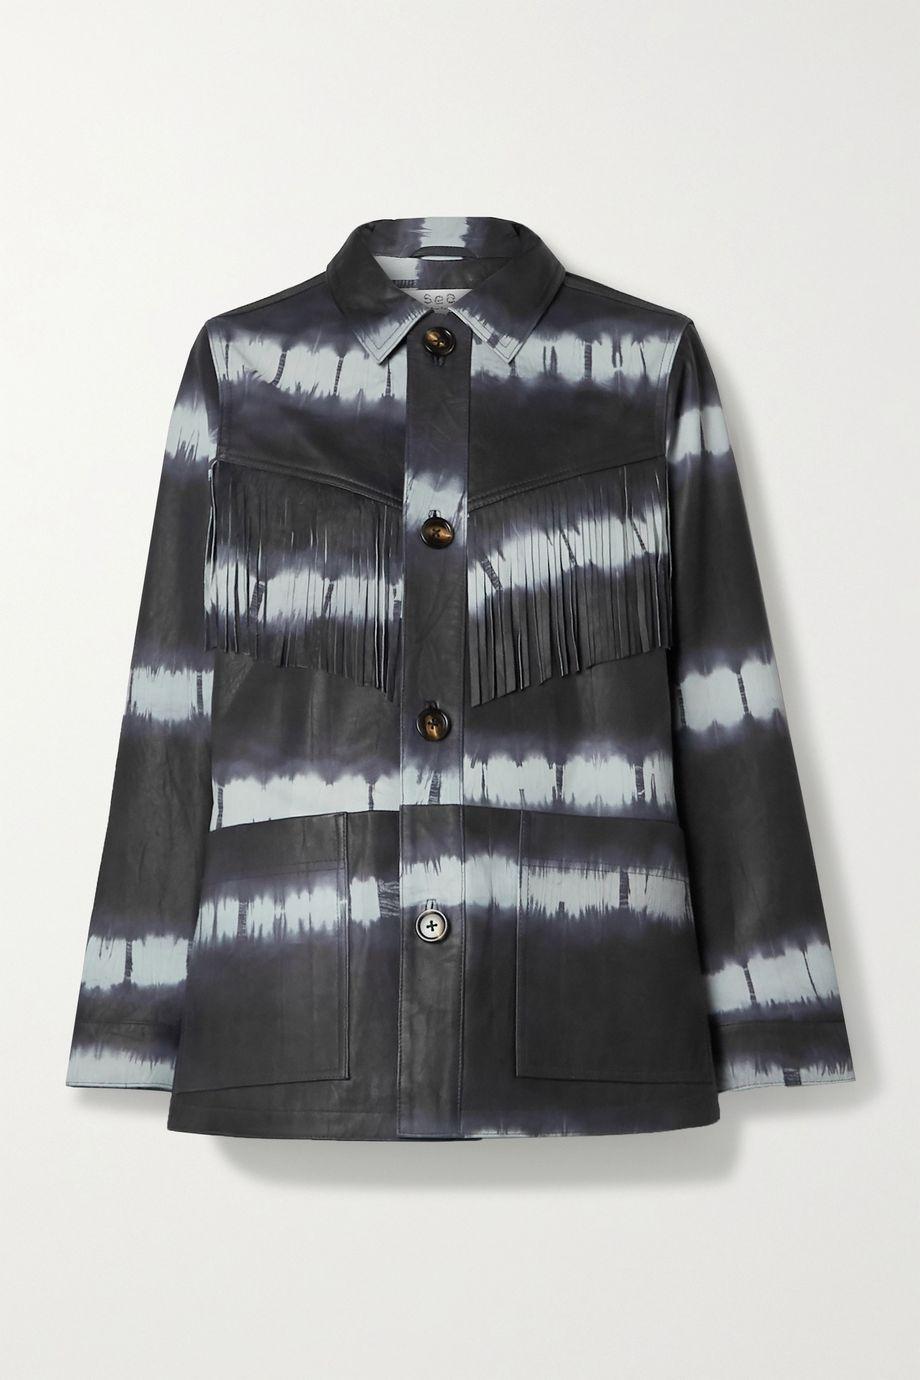 Sea Tilda fringed tie-dyed leather jacket